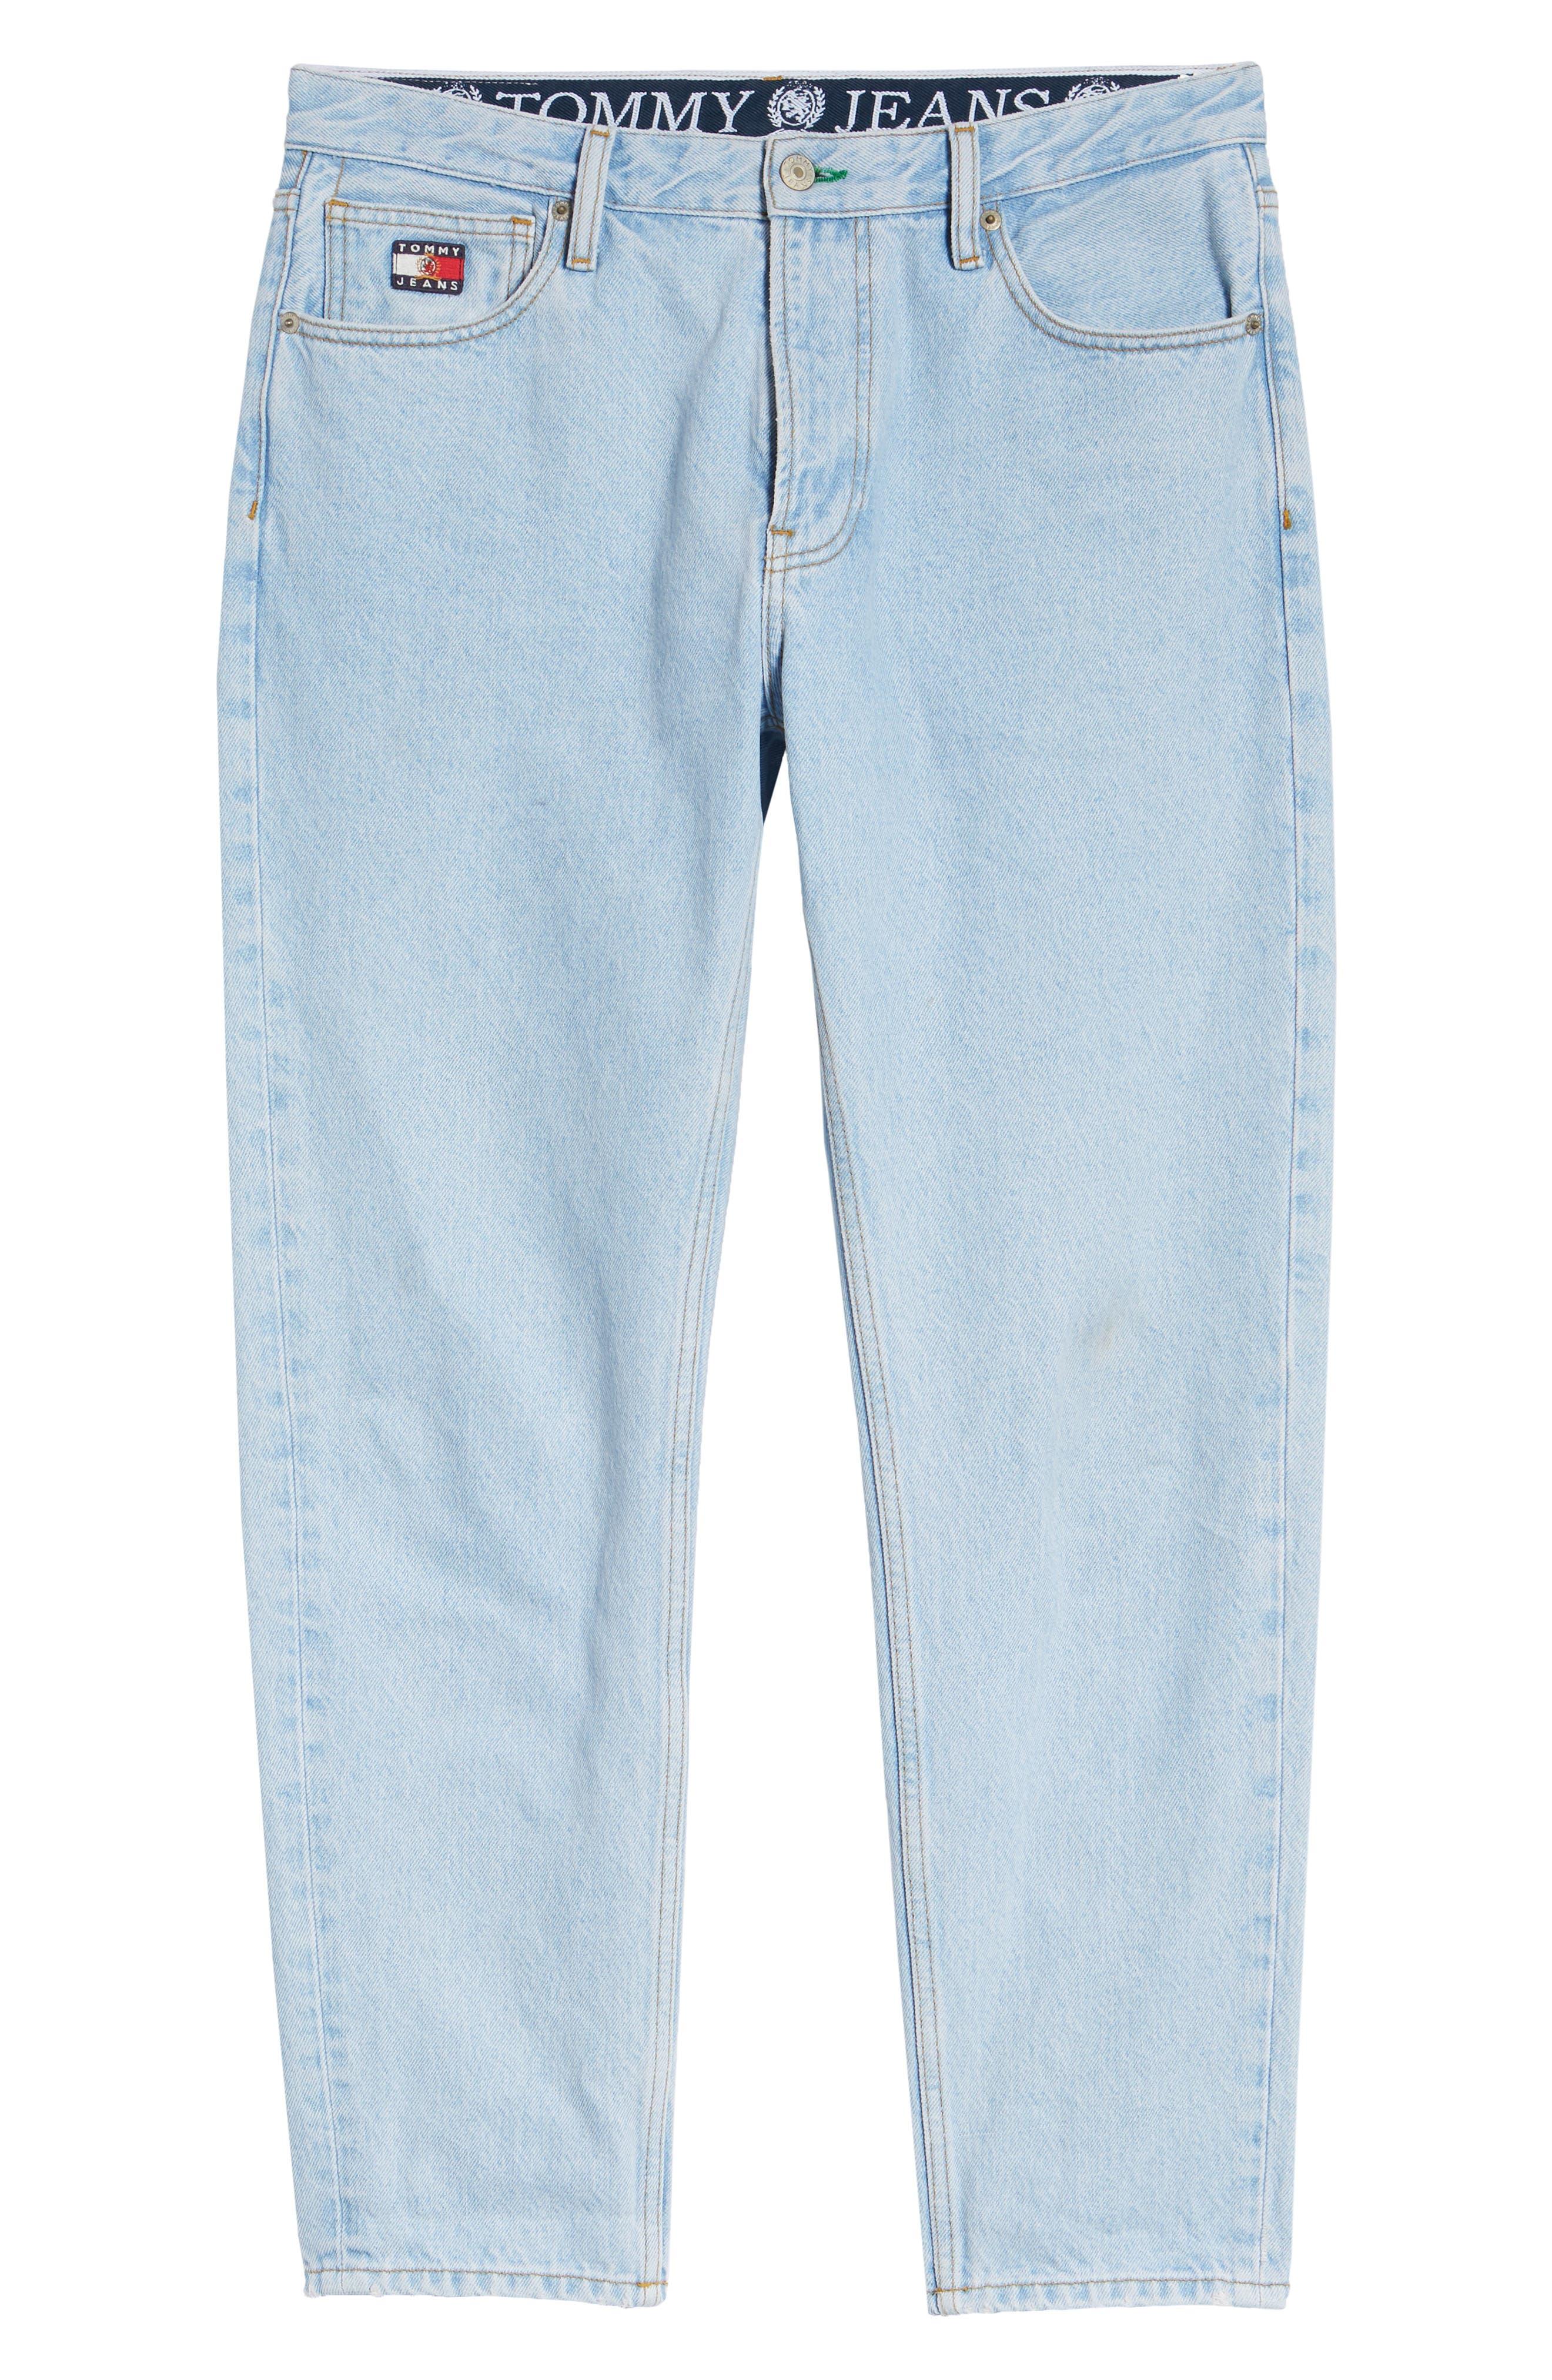 Crest Straight Leg Dad Jeans,                             Alternate thumbnail 6, color,                             LIGHT BLUE DENIM